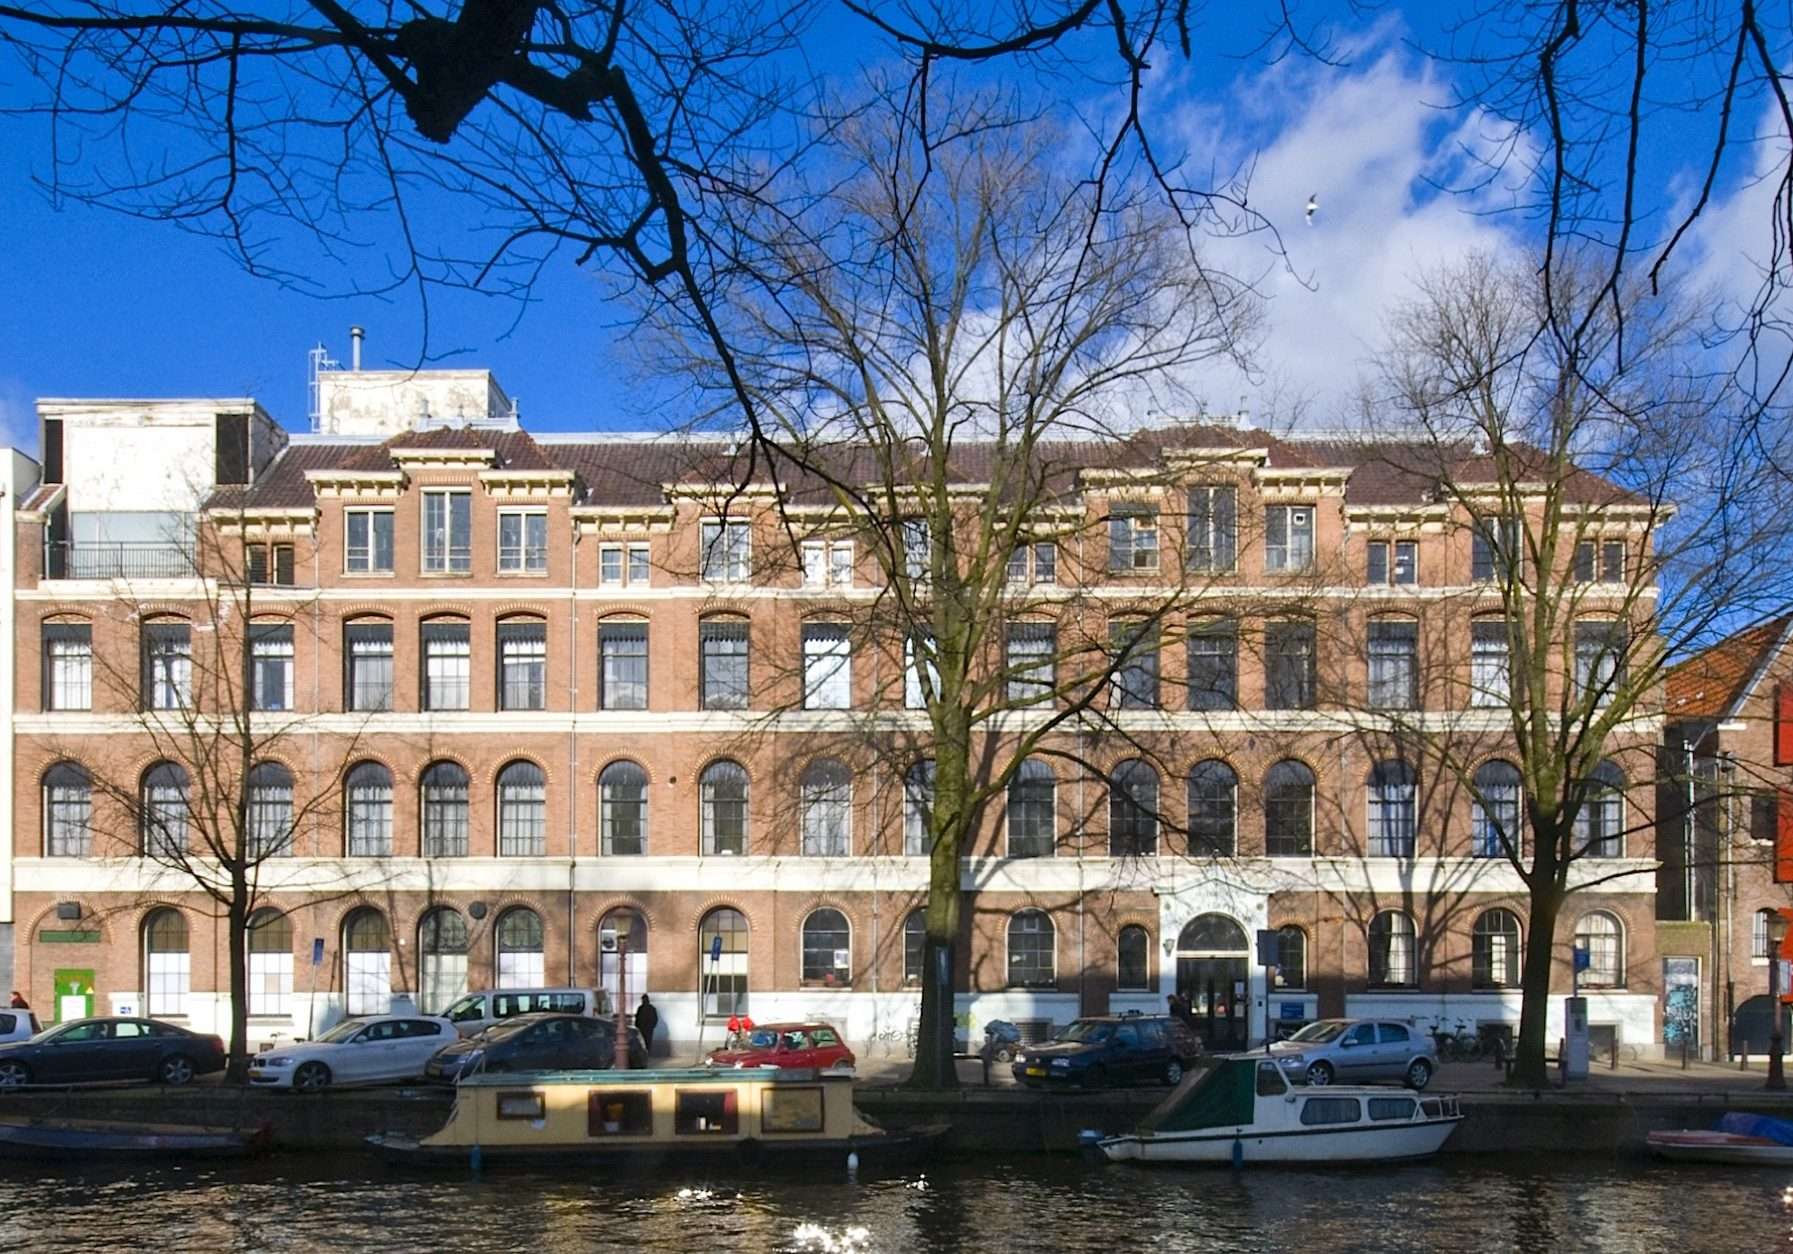 Prinsengrachtziekenhuis | Amsterdam